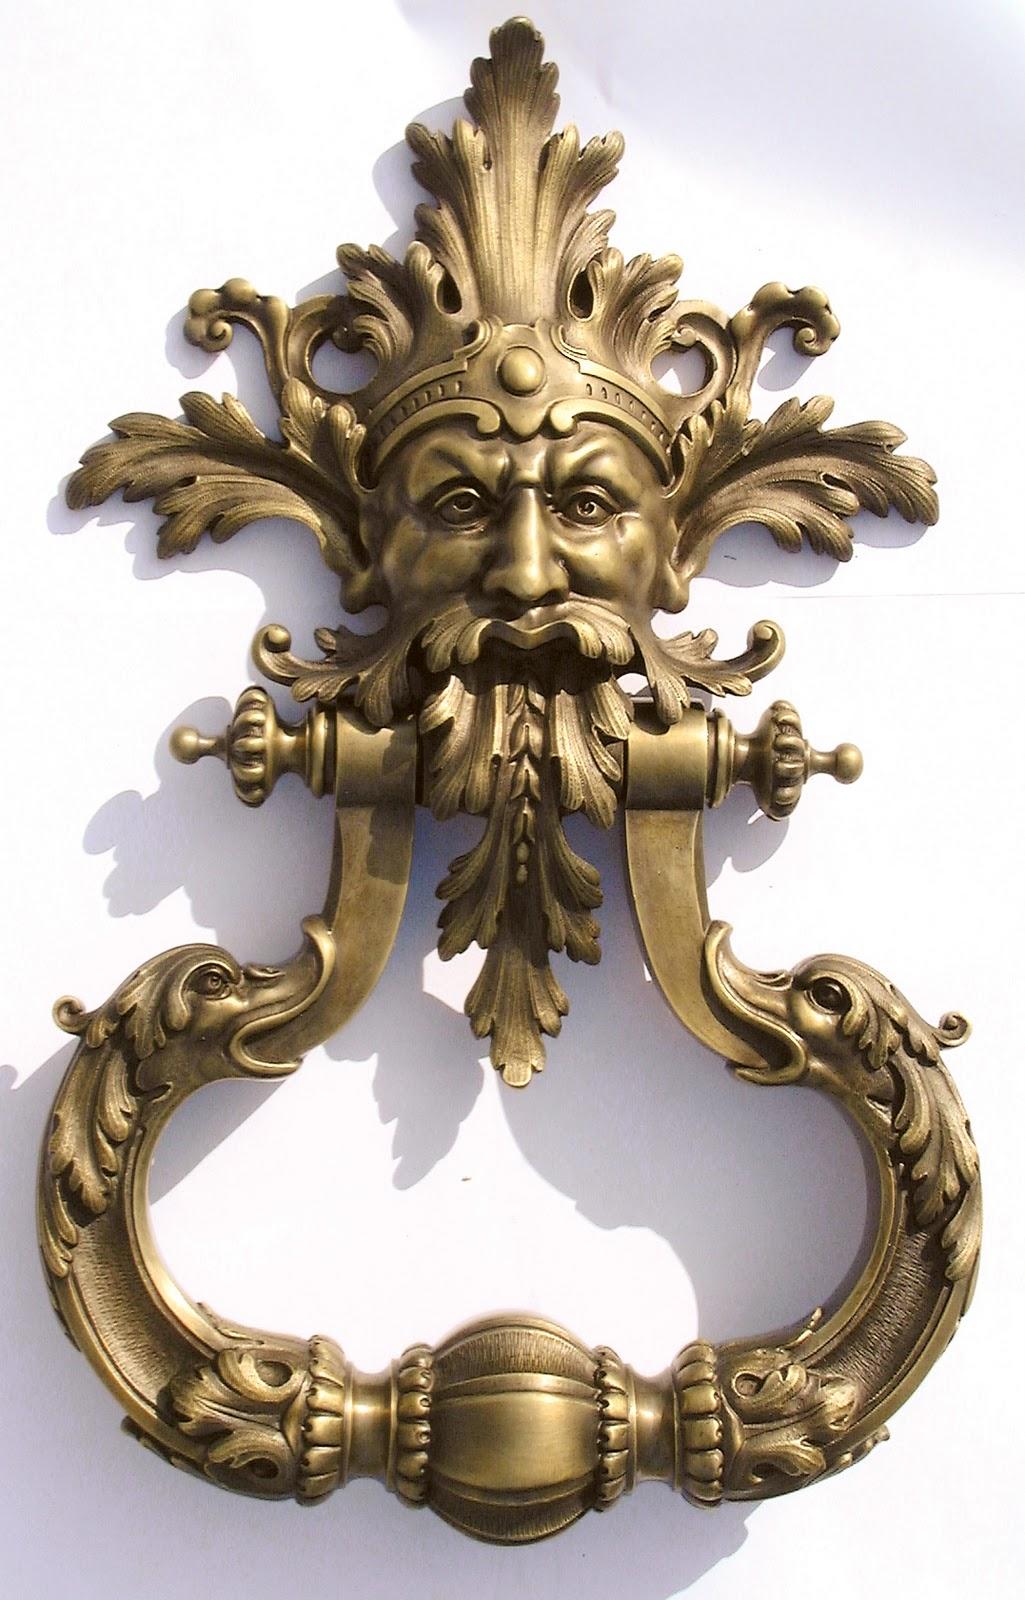 Hooked on hardware a conversation with bronzes de france - Cool door knocker ...